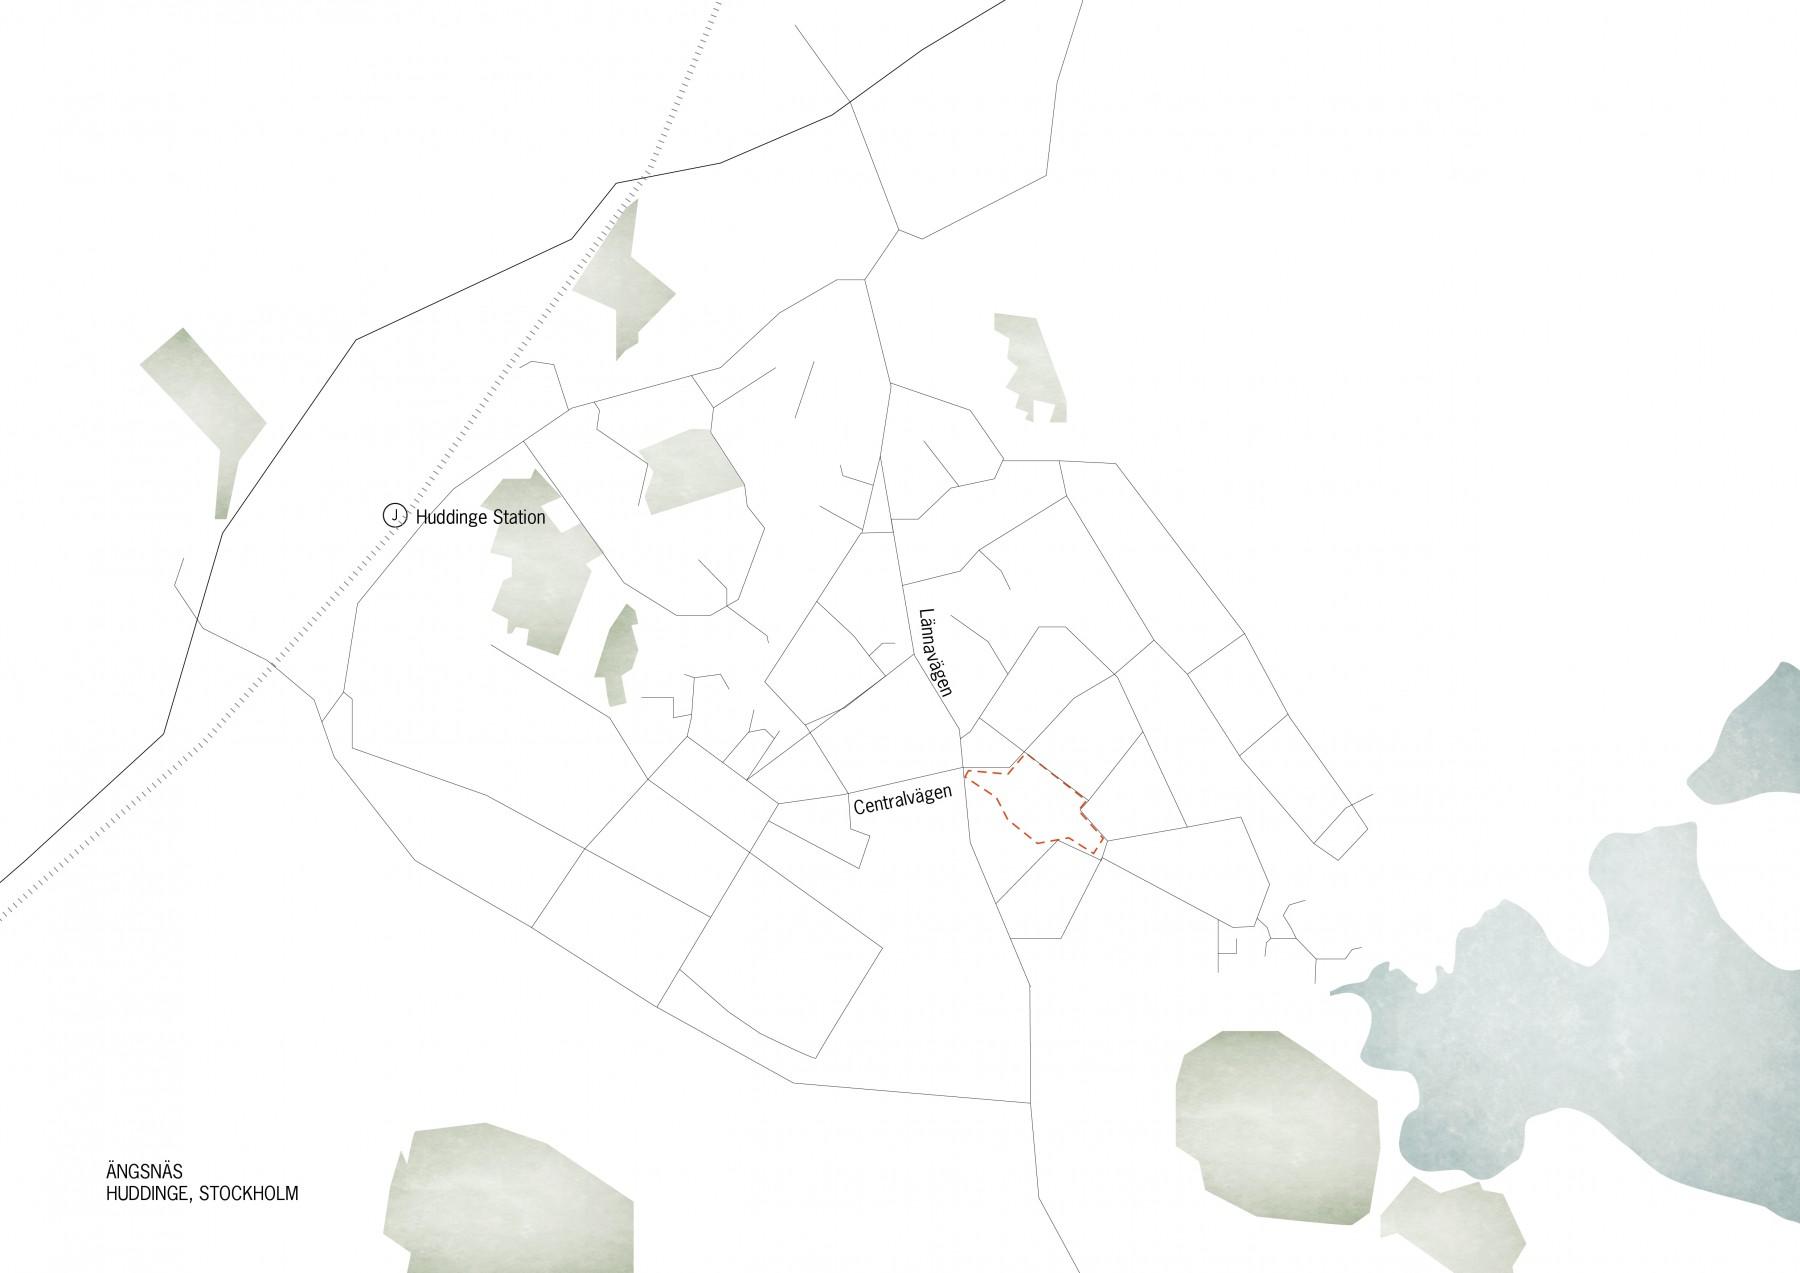 Angsnas_Huddinge_LAND_2012_karta-01